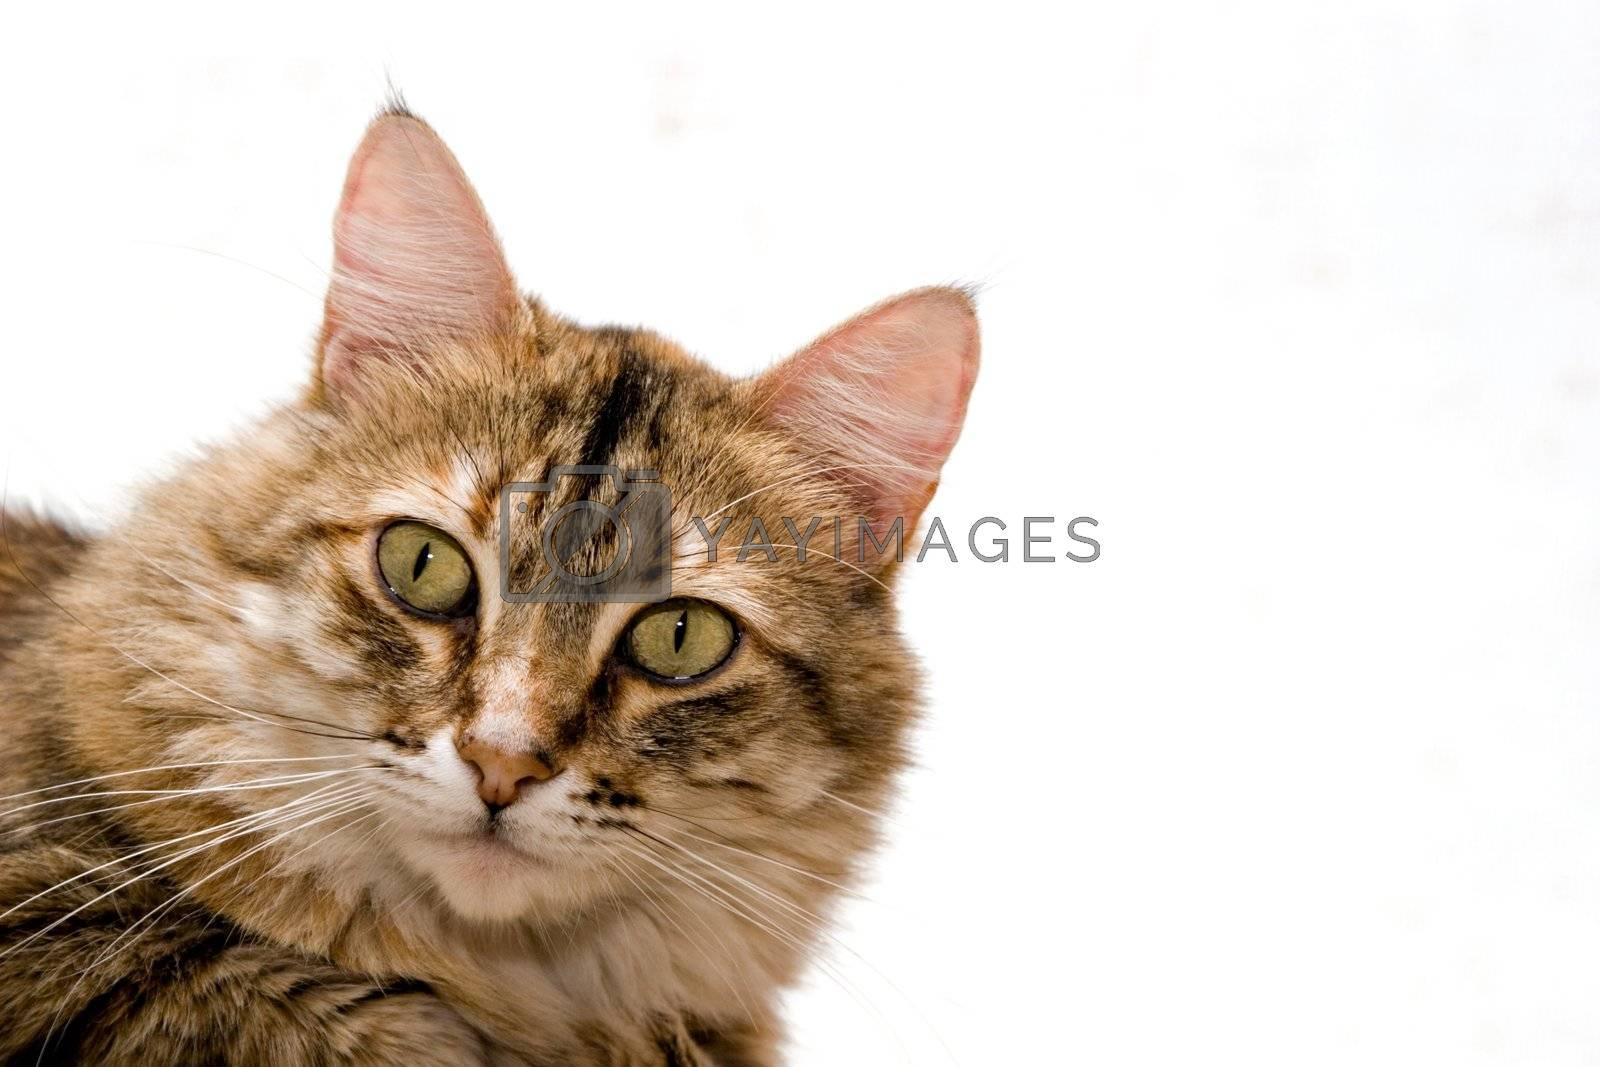 Cat close-up isolated on white background